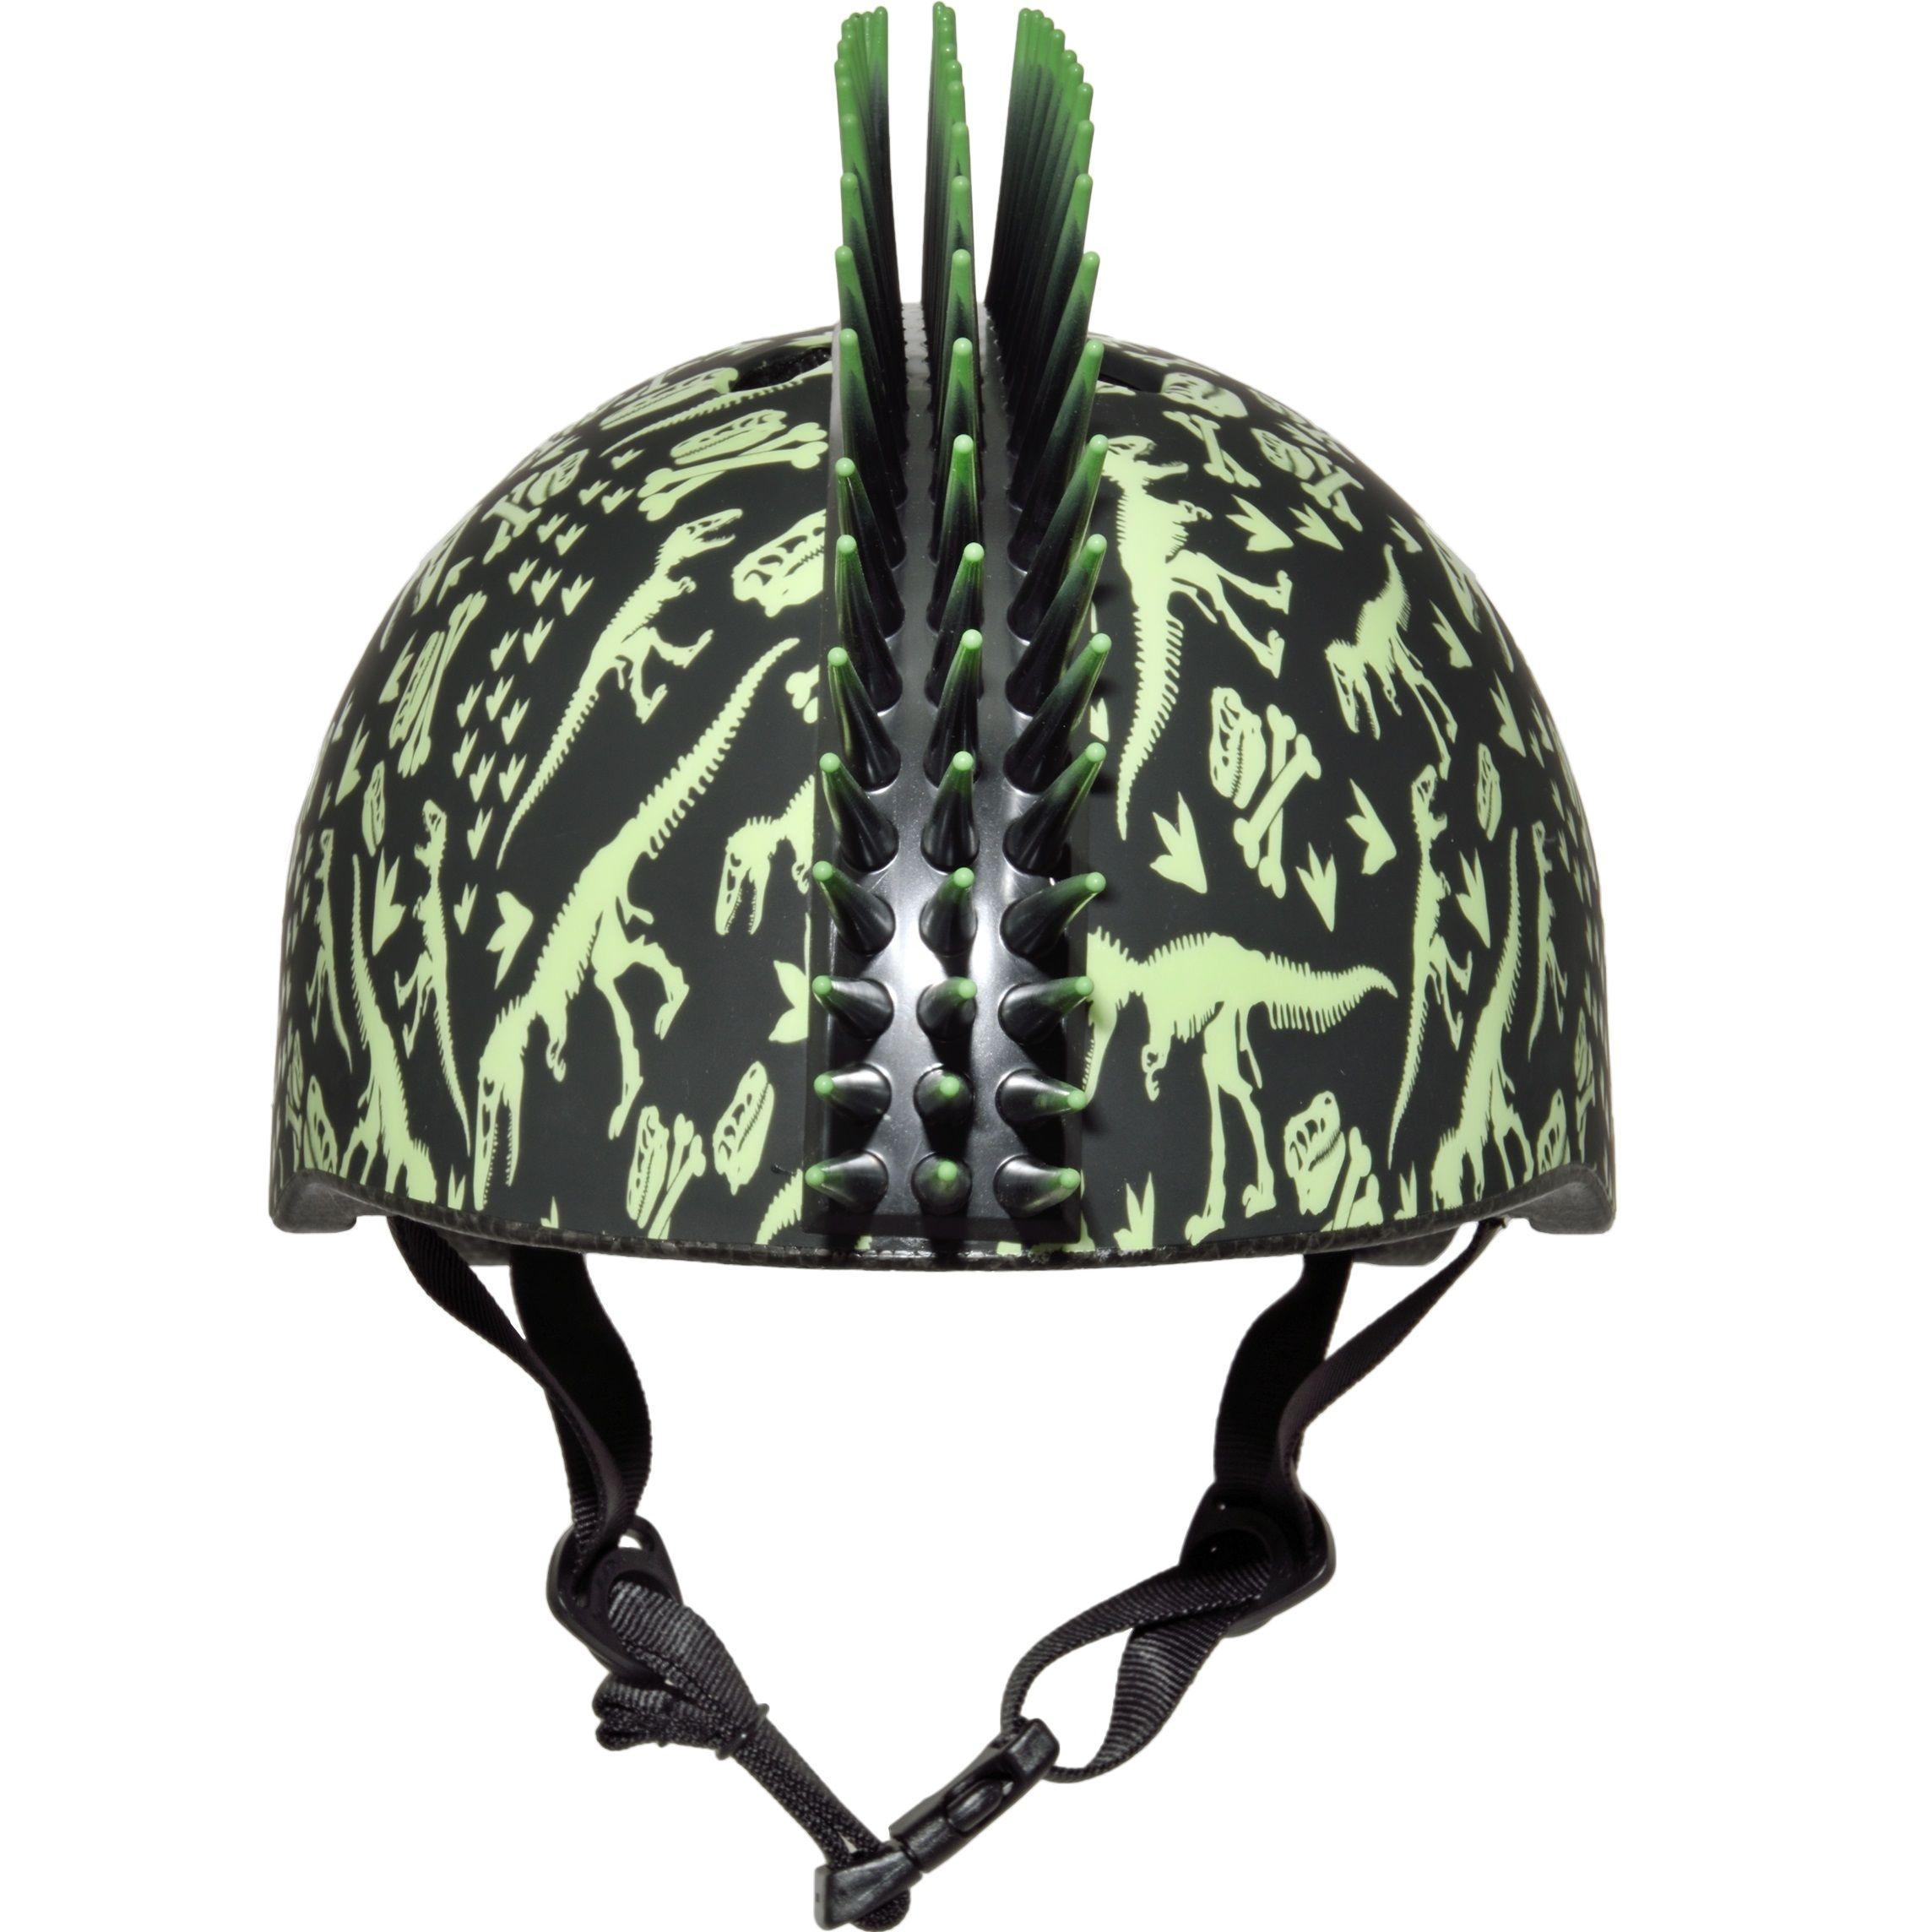 Raskullz trex bonez mohawk toddler helmet black and green